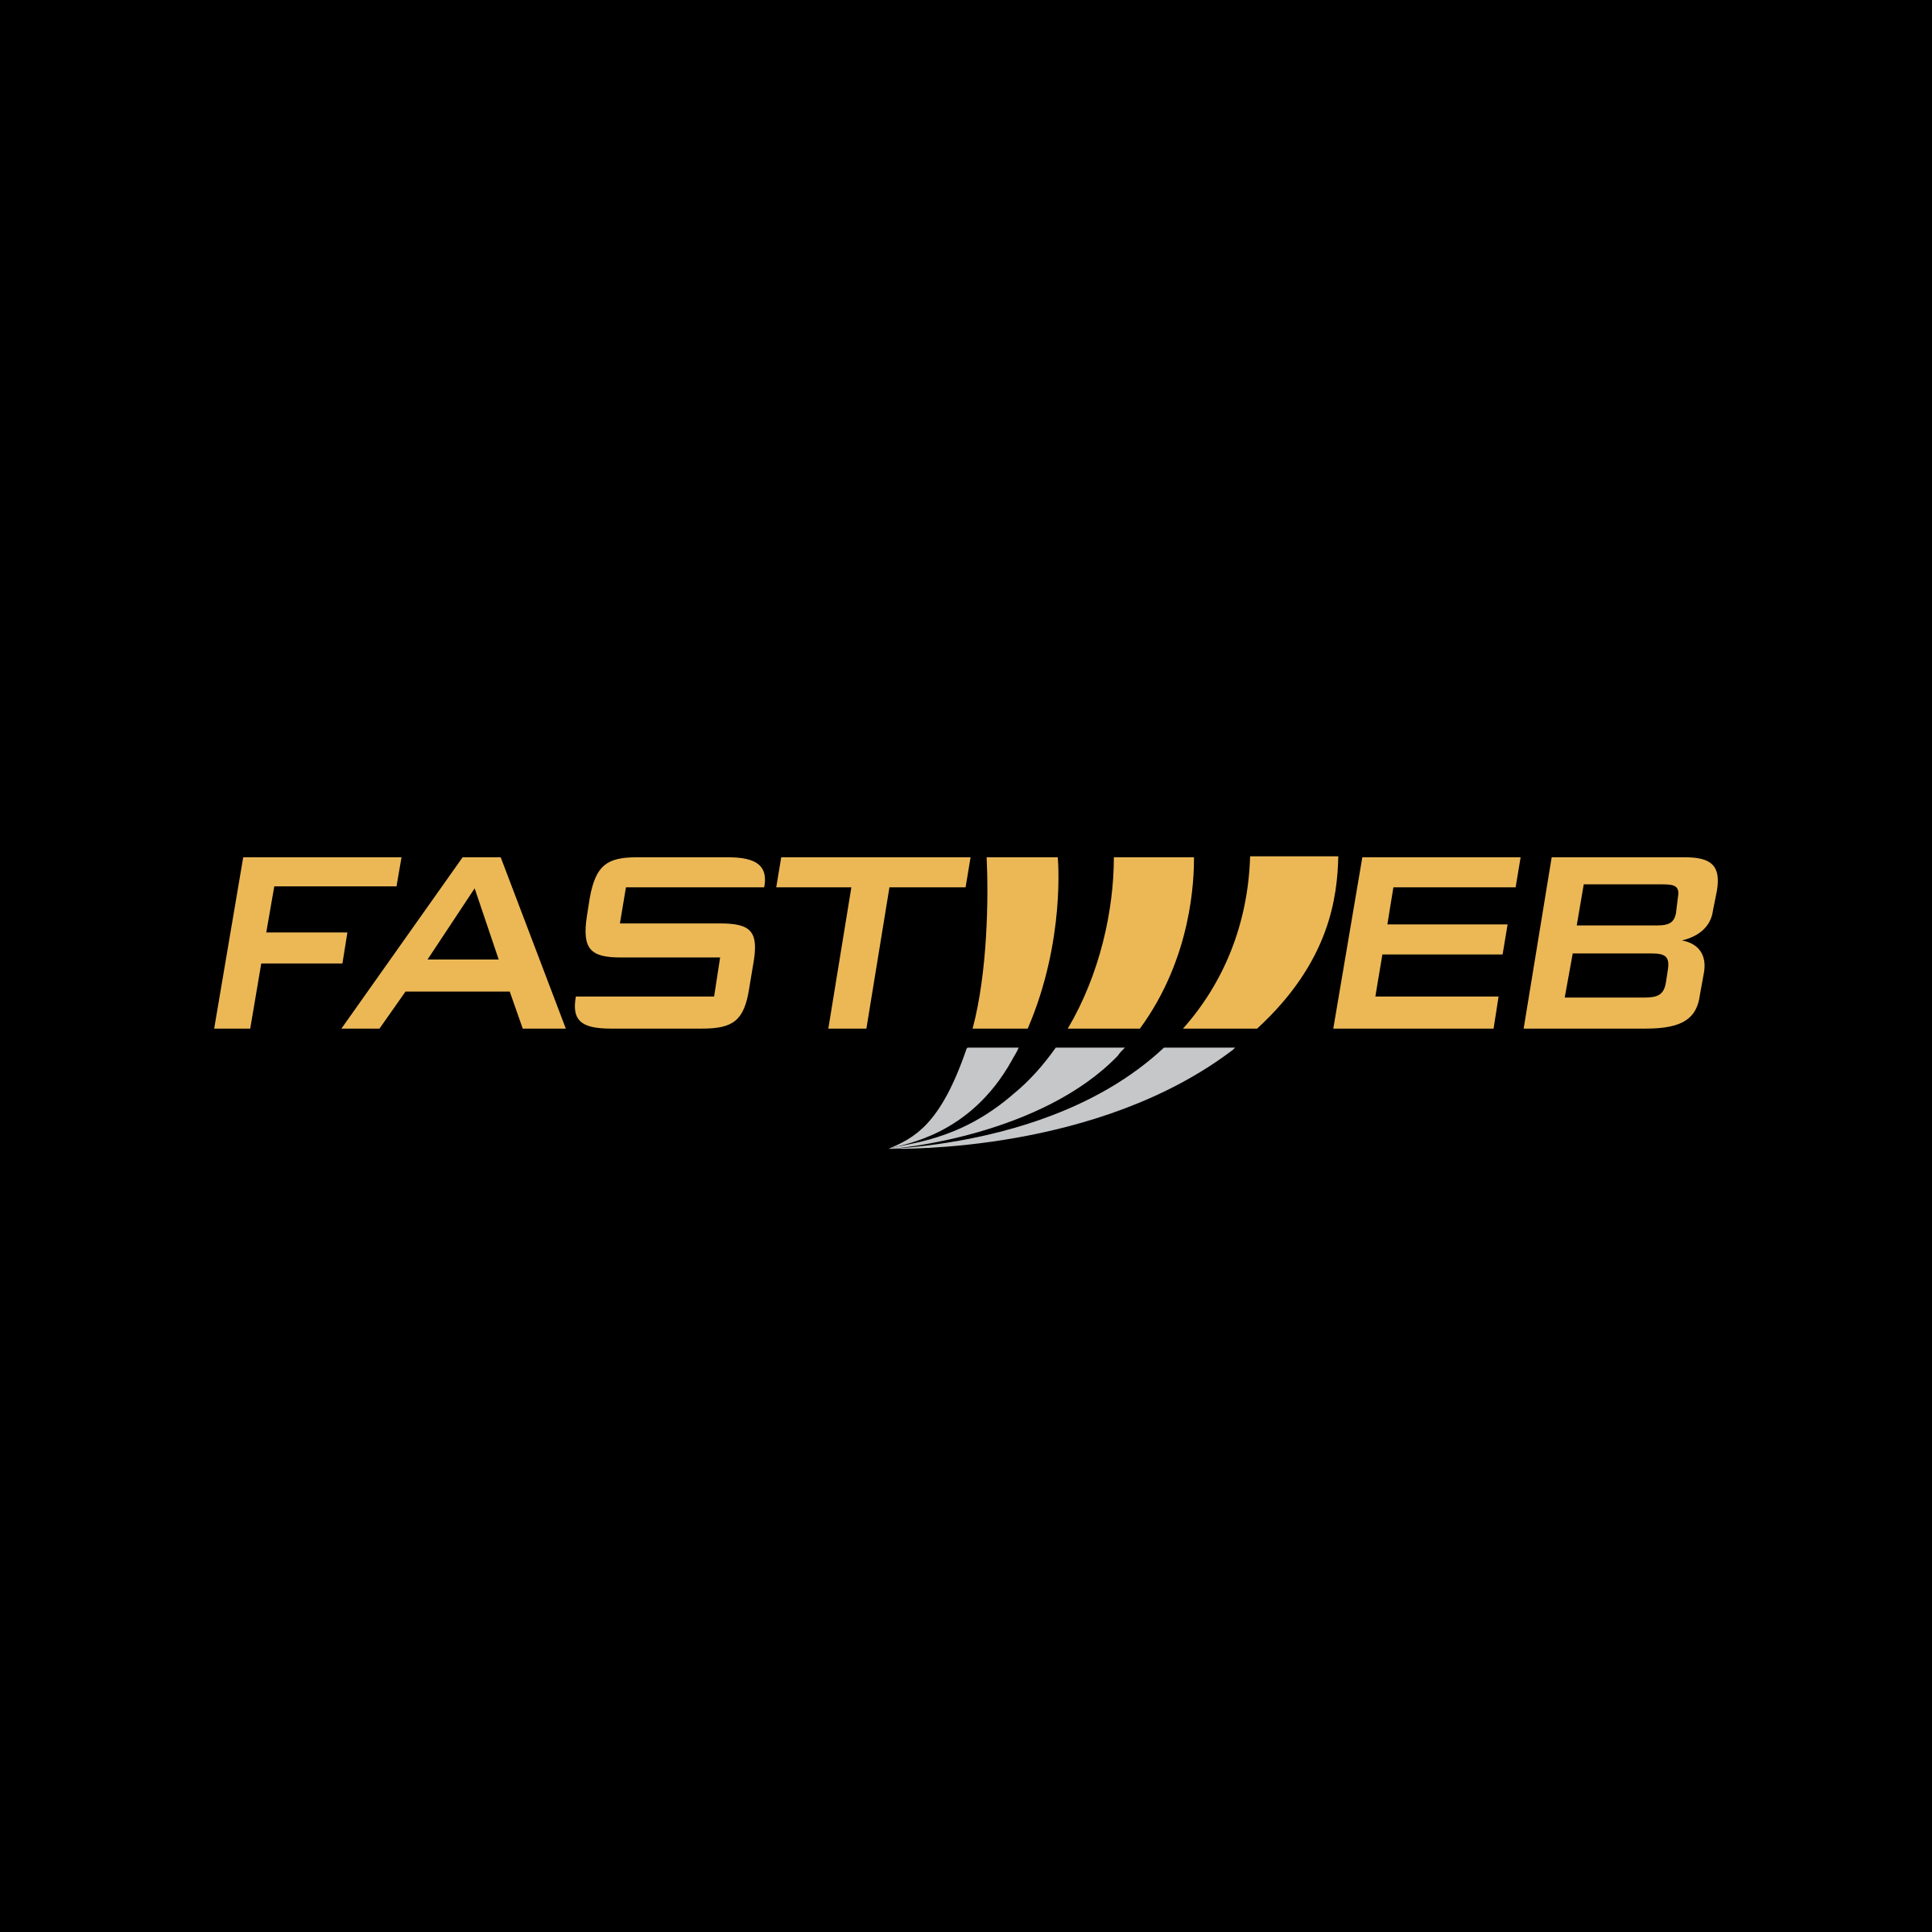 FastWeb Logo PNG Transparent & SVG Vector.